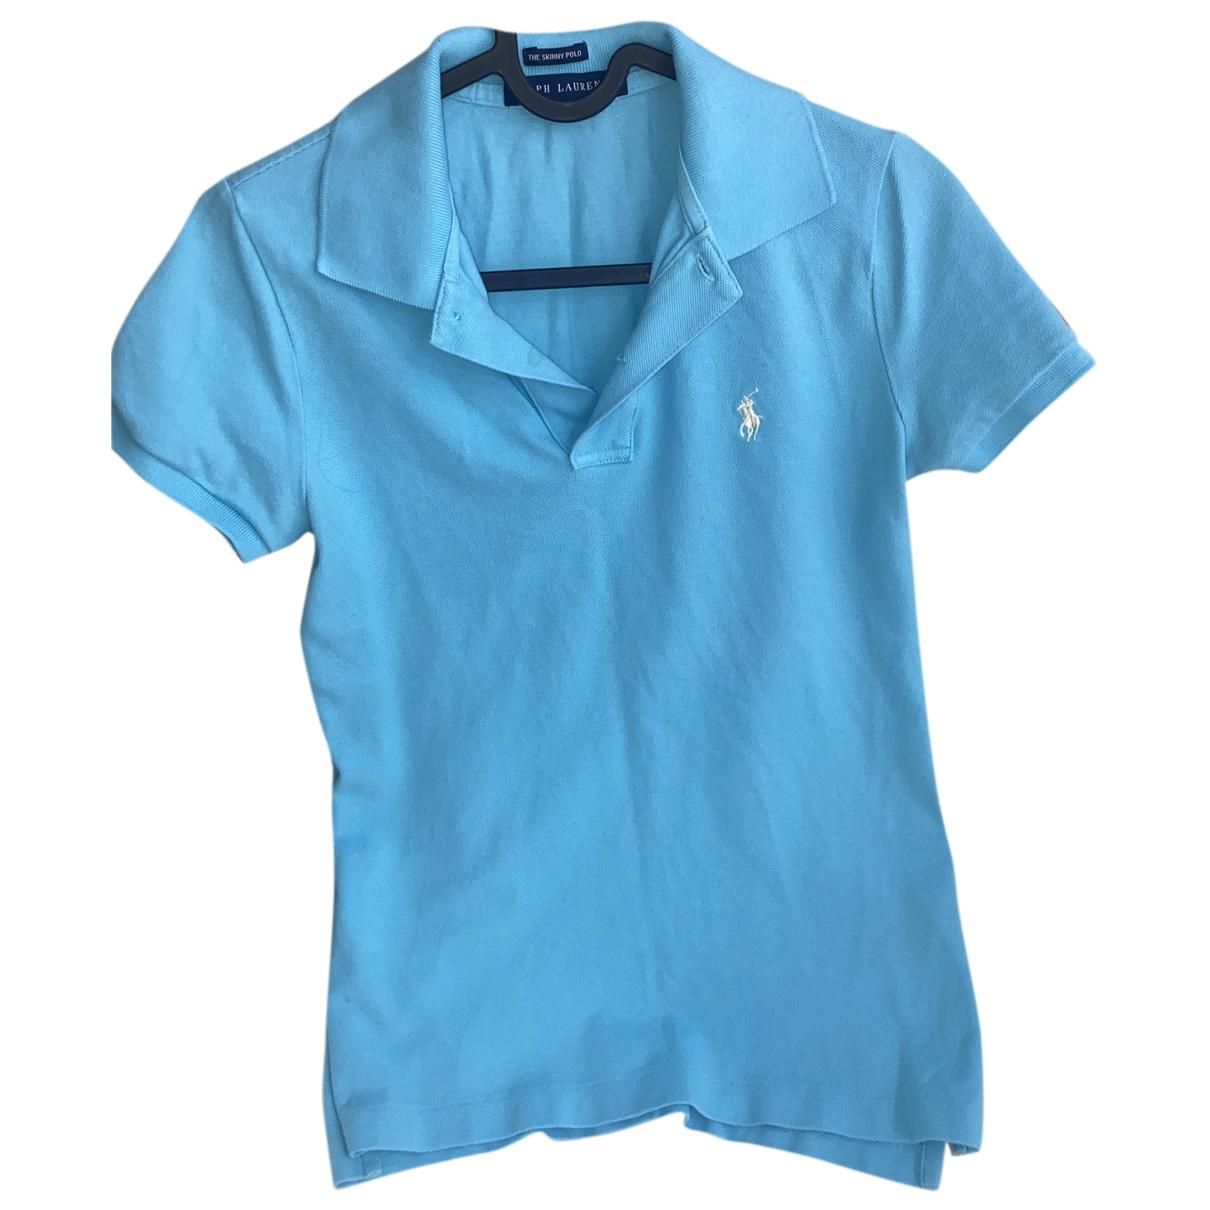 Polo Ralph Lauren - Top Polo ajuste manches courtes pour femme en coton - bleu